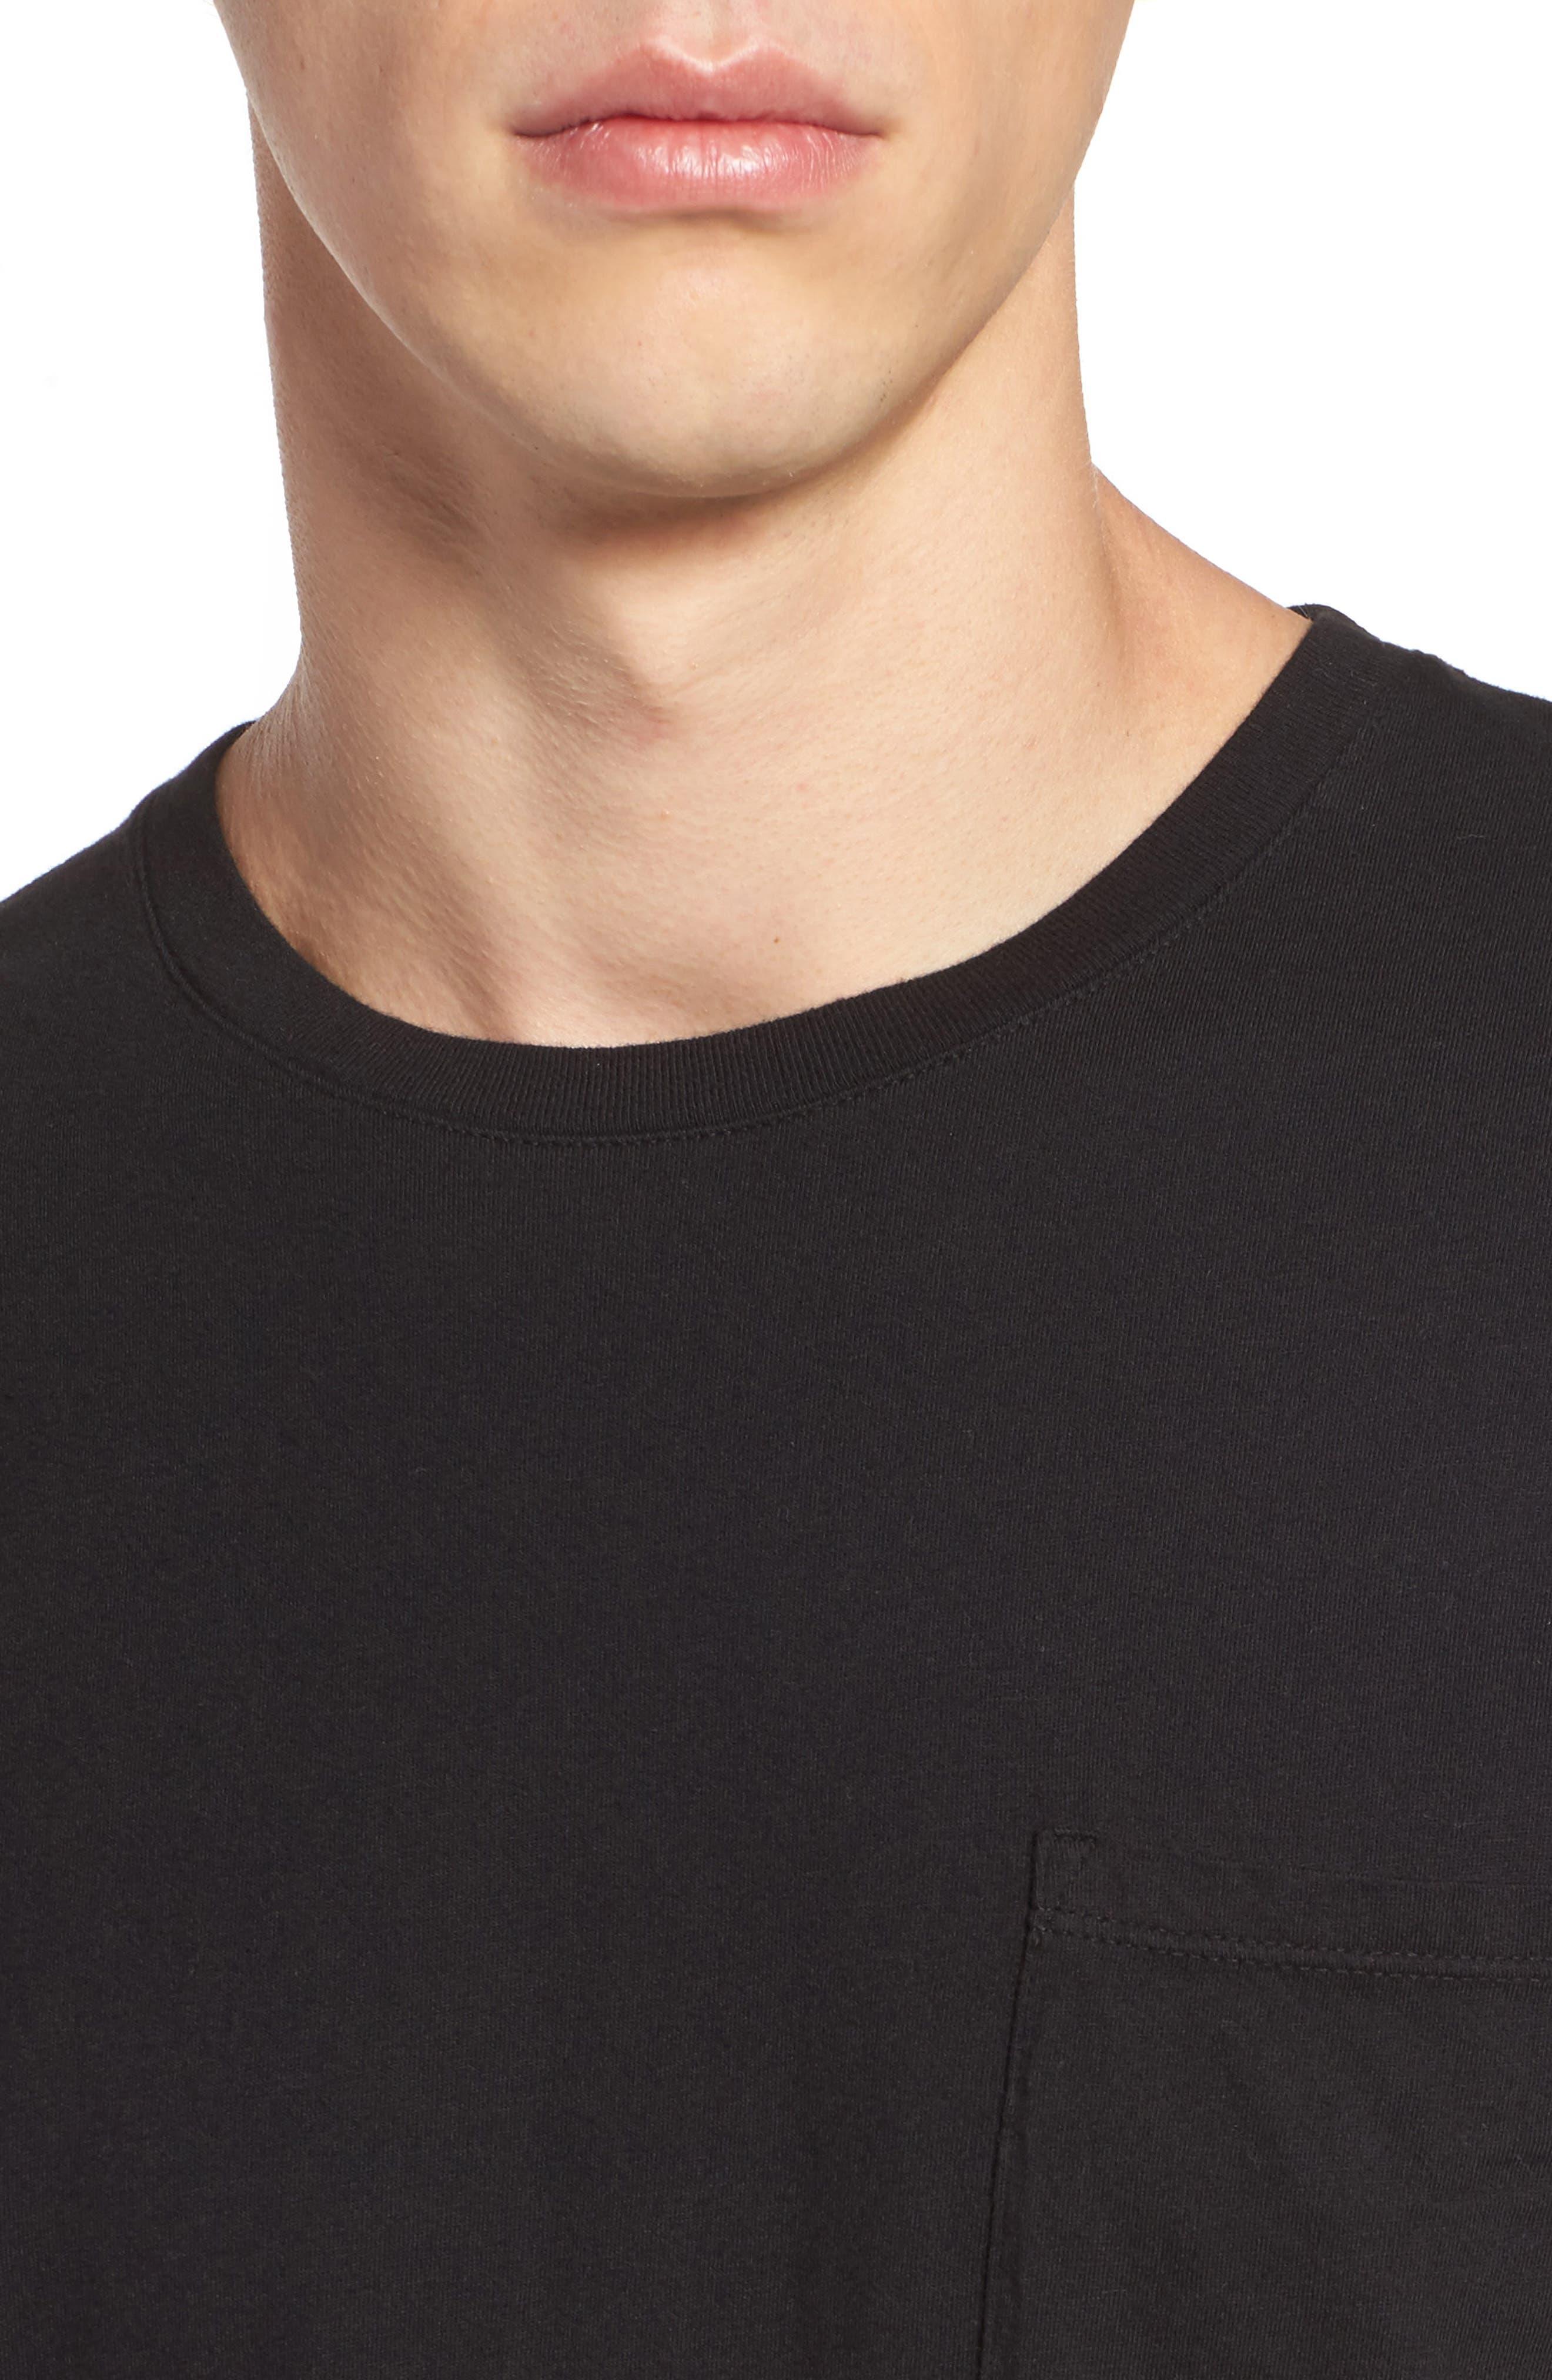 RICHER POORER, Lounge Pocket T-Shirt, Alternate thumbnail 4, color, BLACK